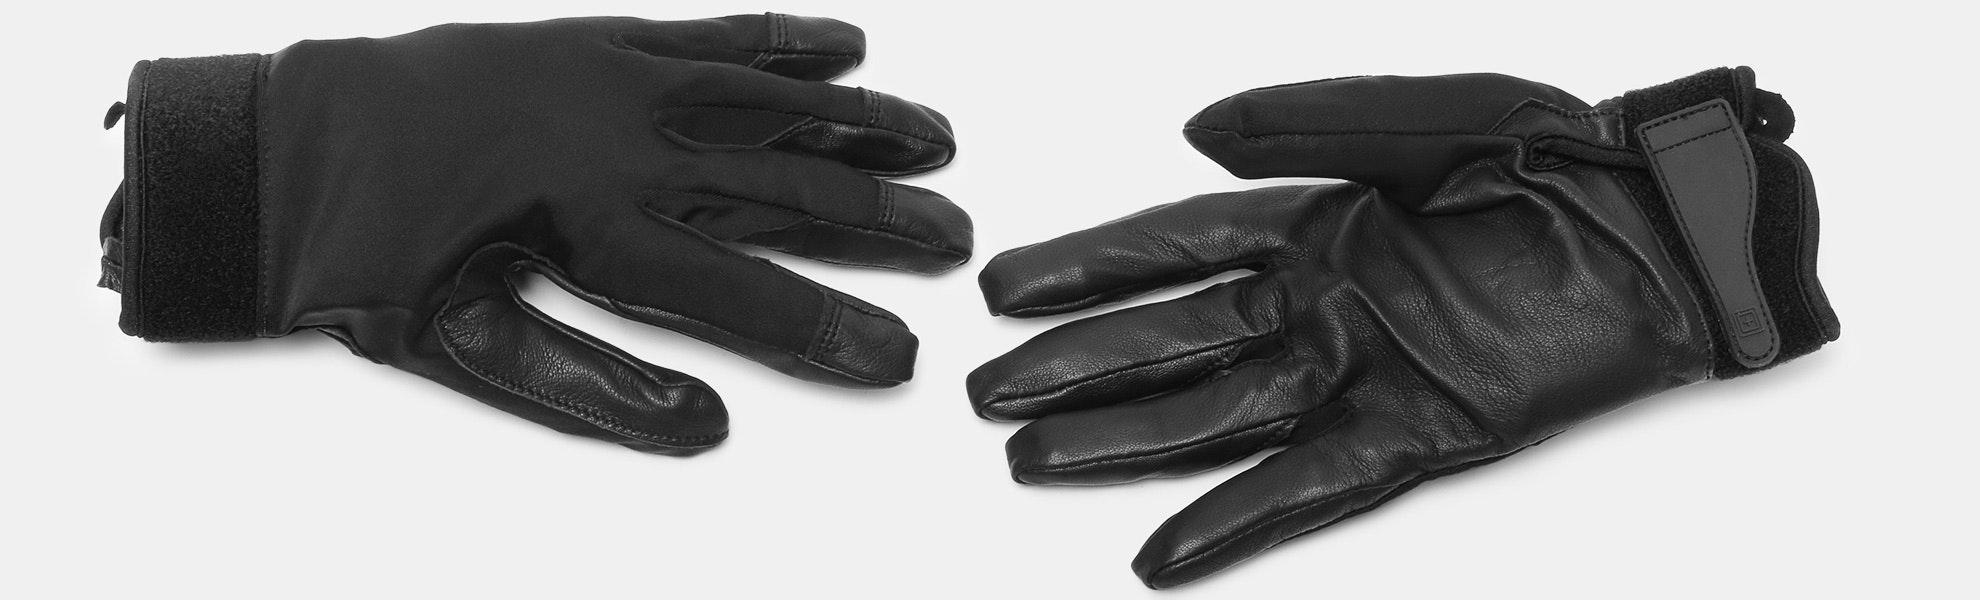 5.11 Tactical Taclite2 Gloves